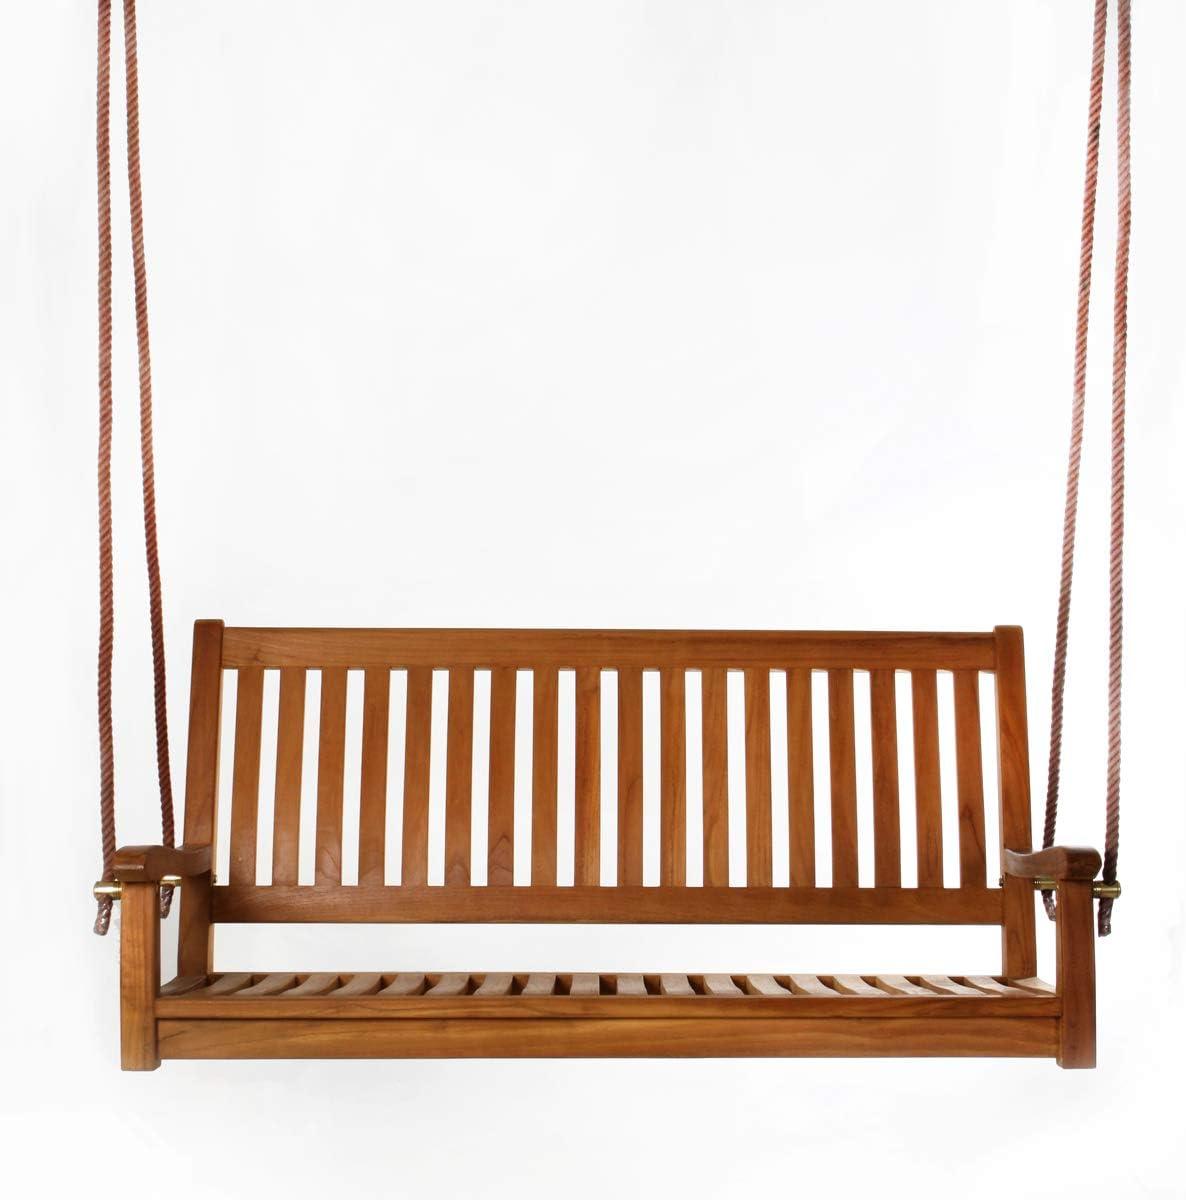 All Things Cedar TS50 Teak Porch Swing